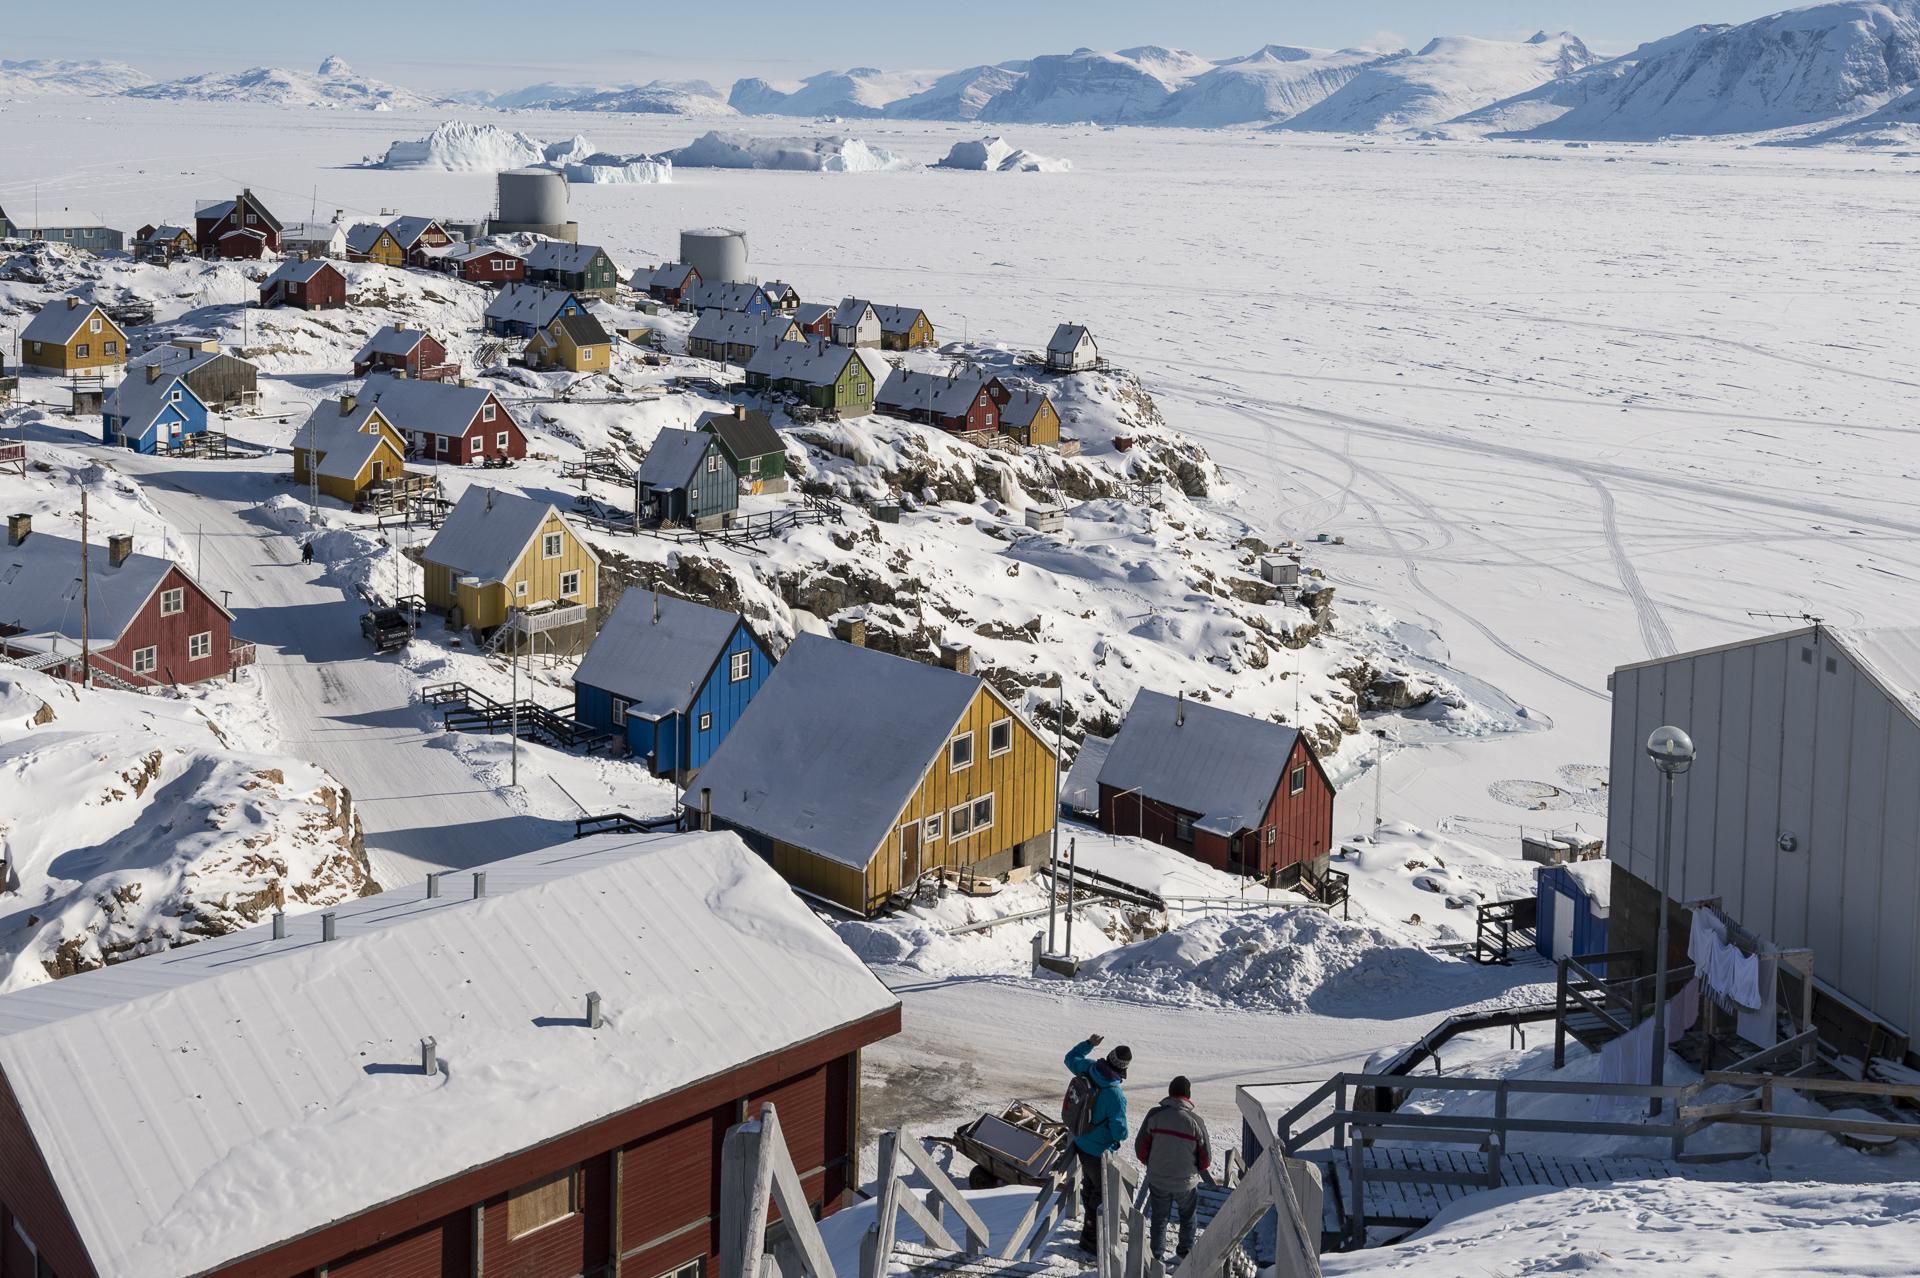 6.Defibaugh_Greenland_Uummannaq_a_65.jpg